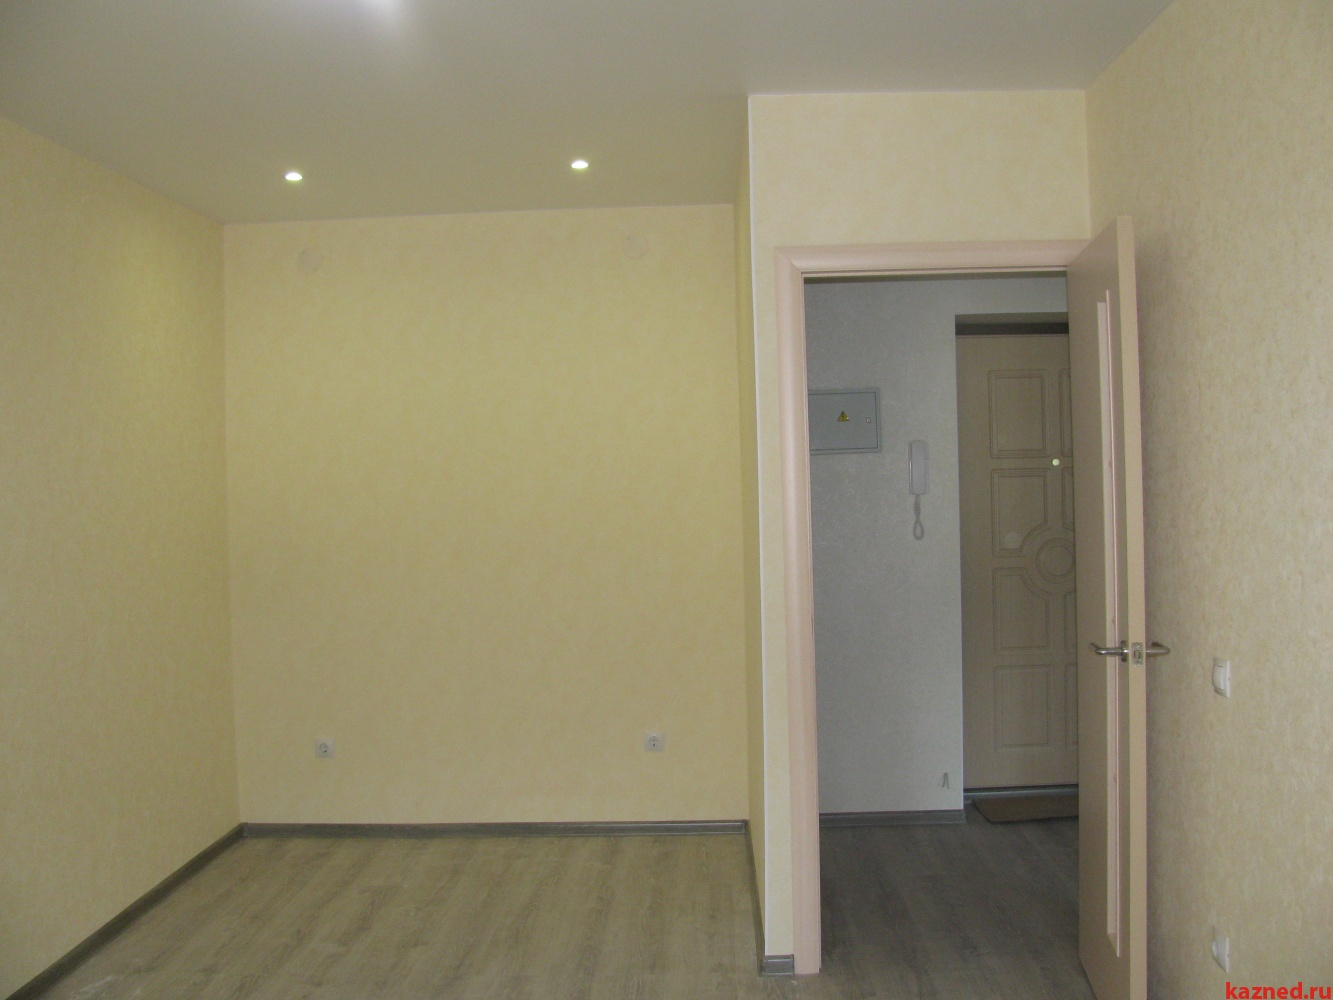 Царево, 34 кв.м. дом сдан квартира с евро ремонтом (миниатюра №17)